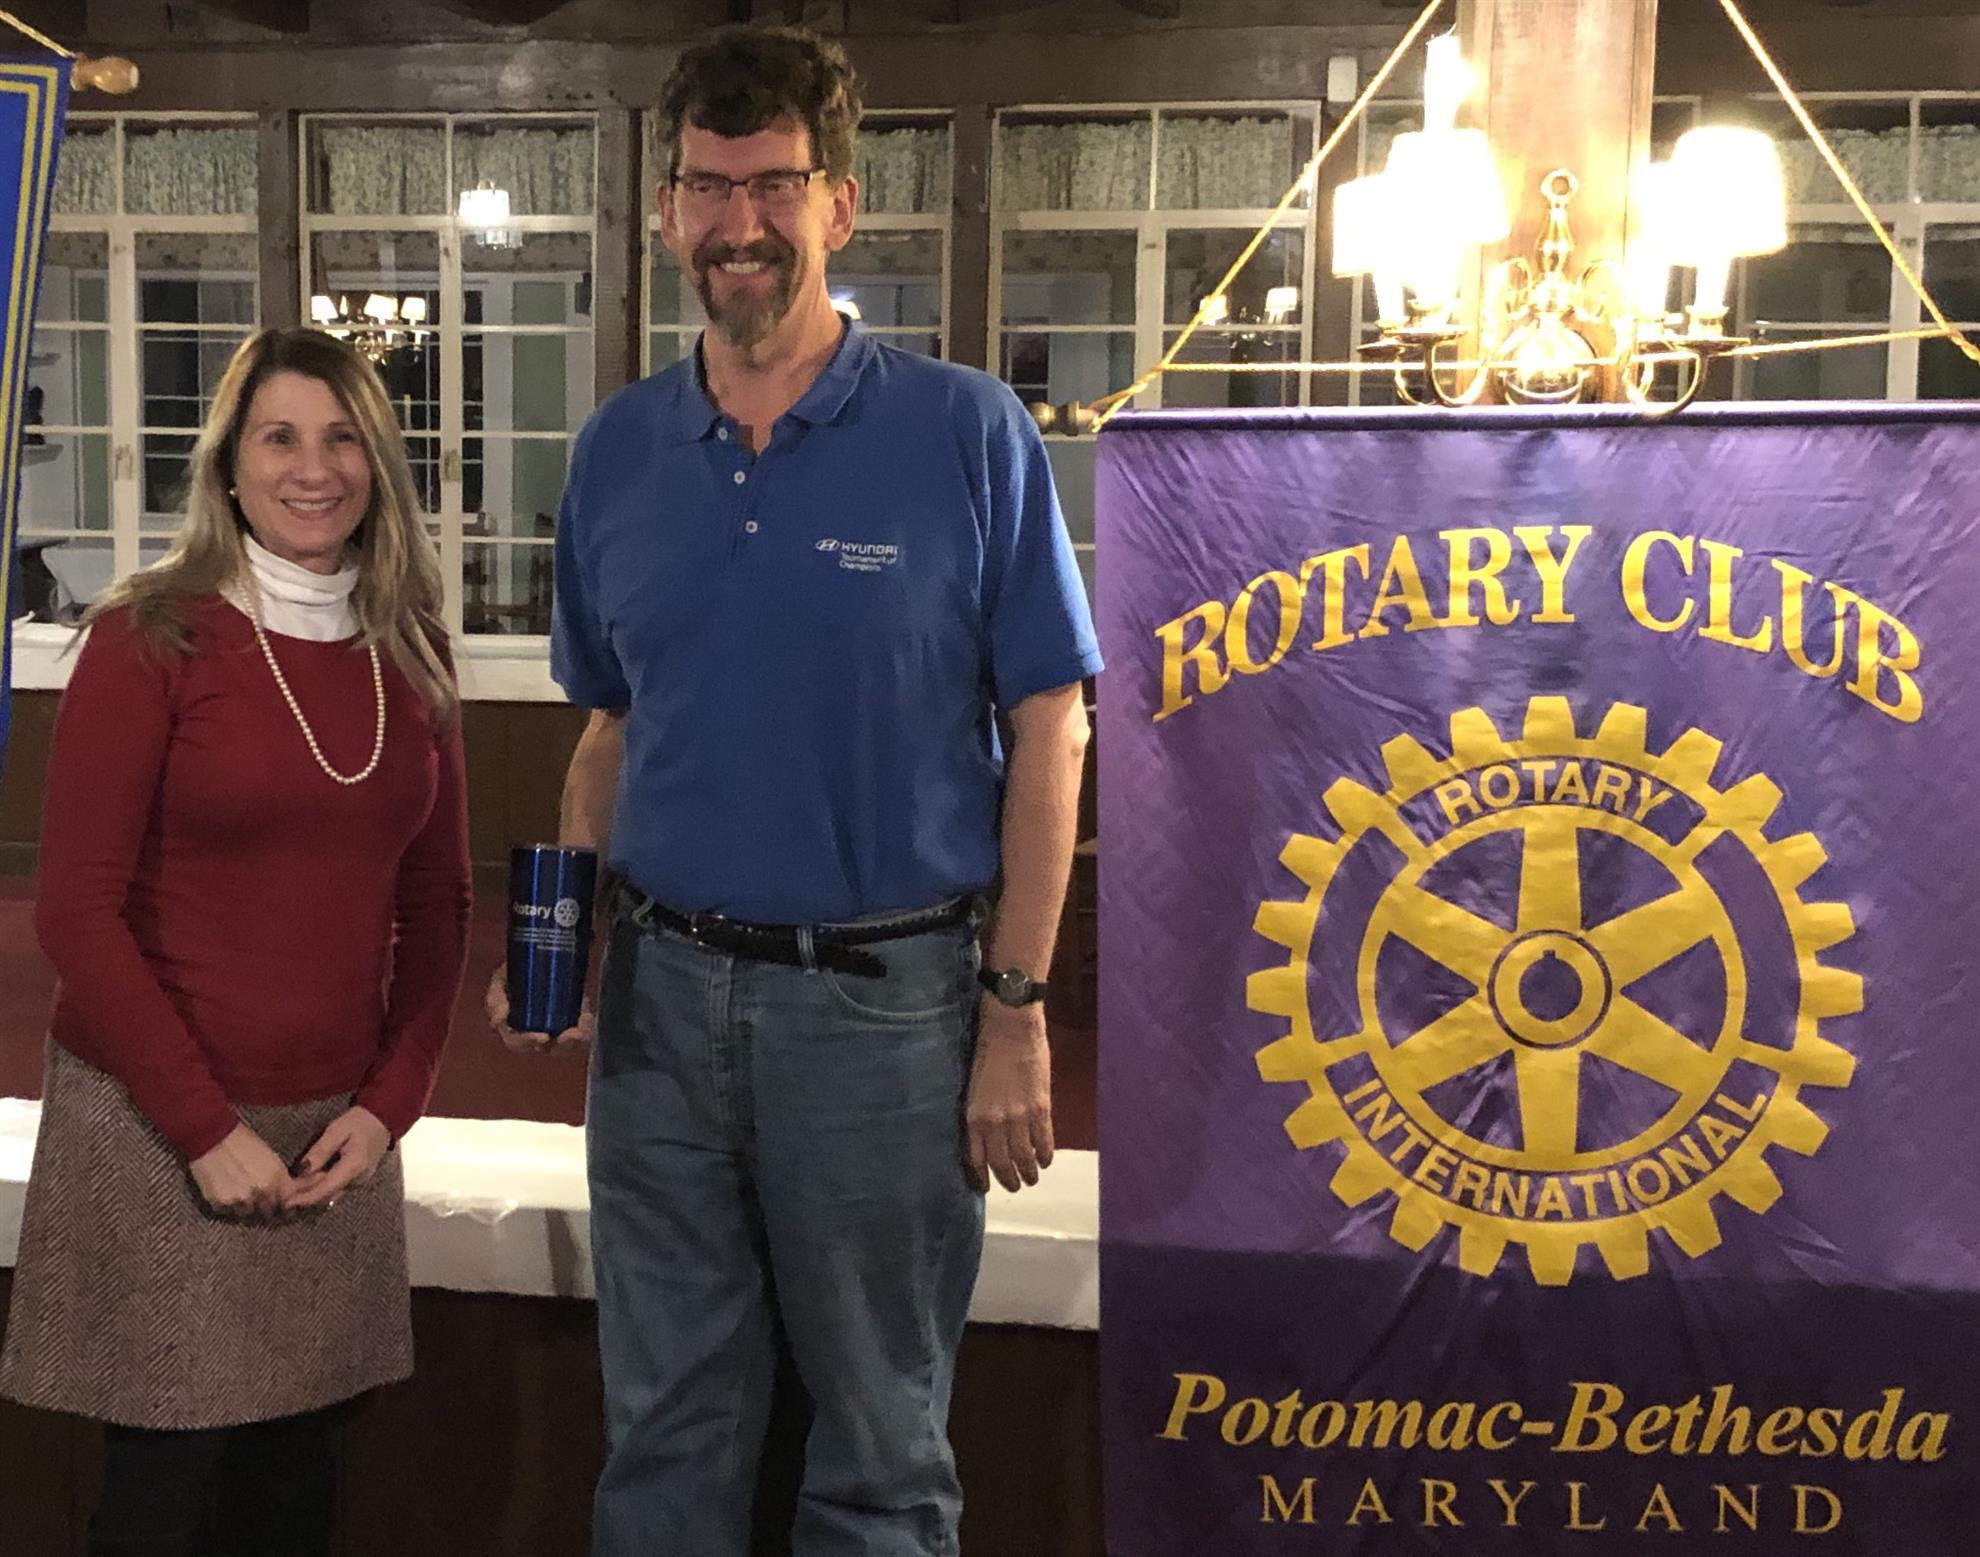 Stories | Rotary Club of Potomac-Bethesda